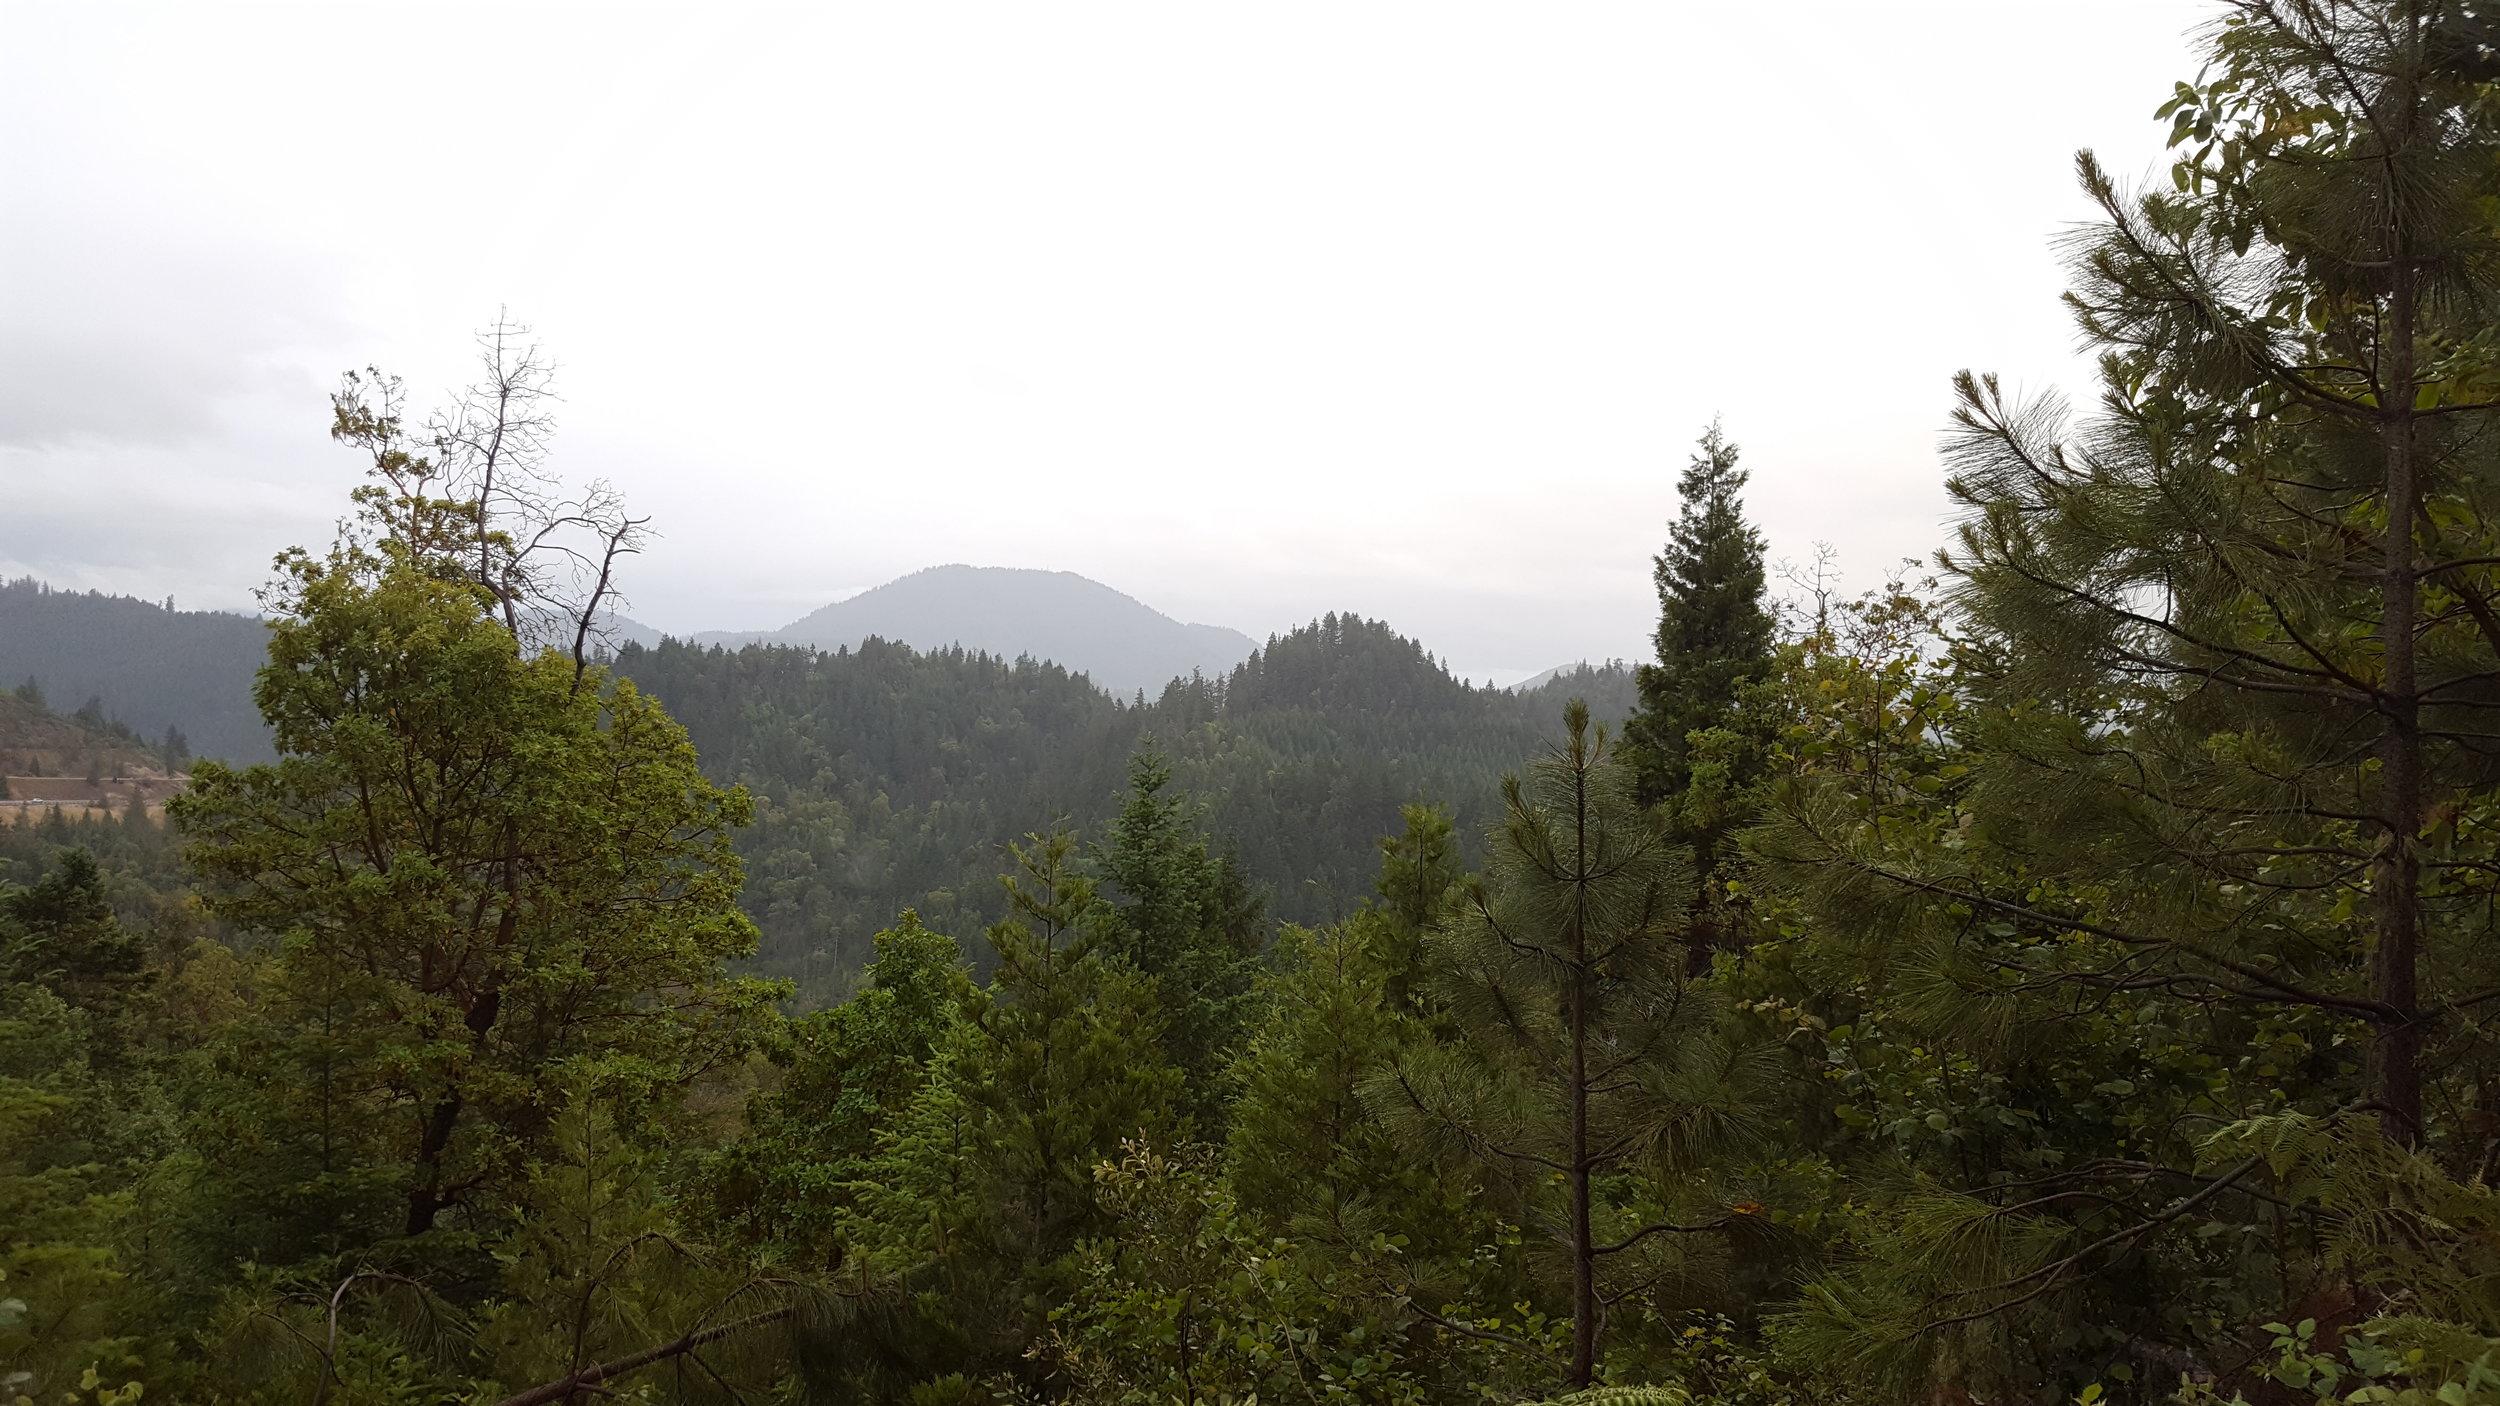 Road to London Peak Trail